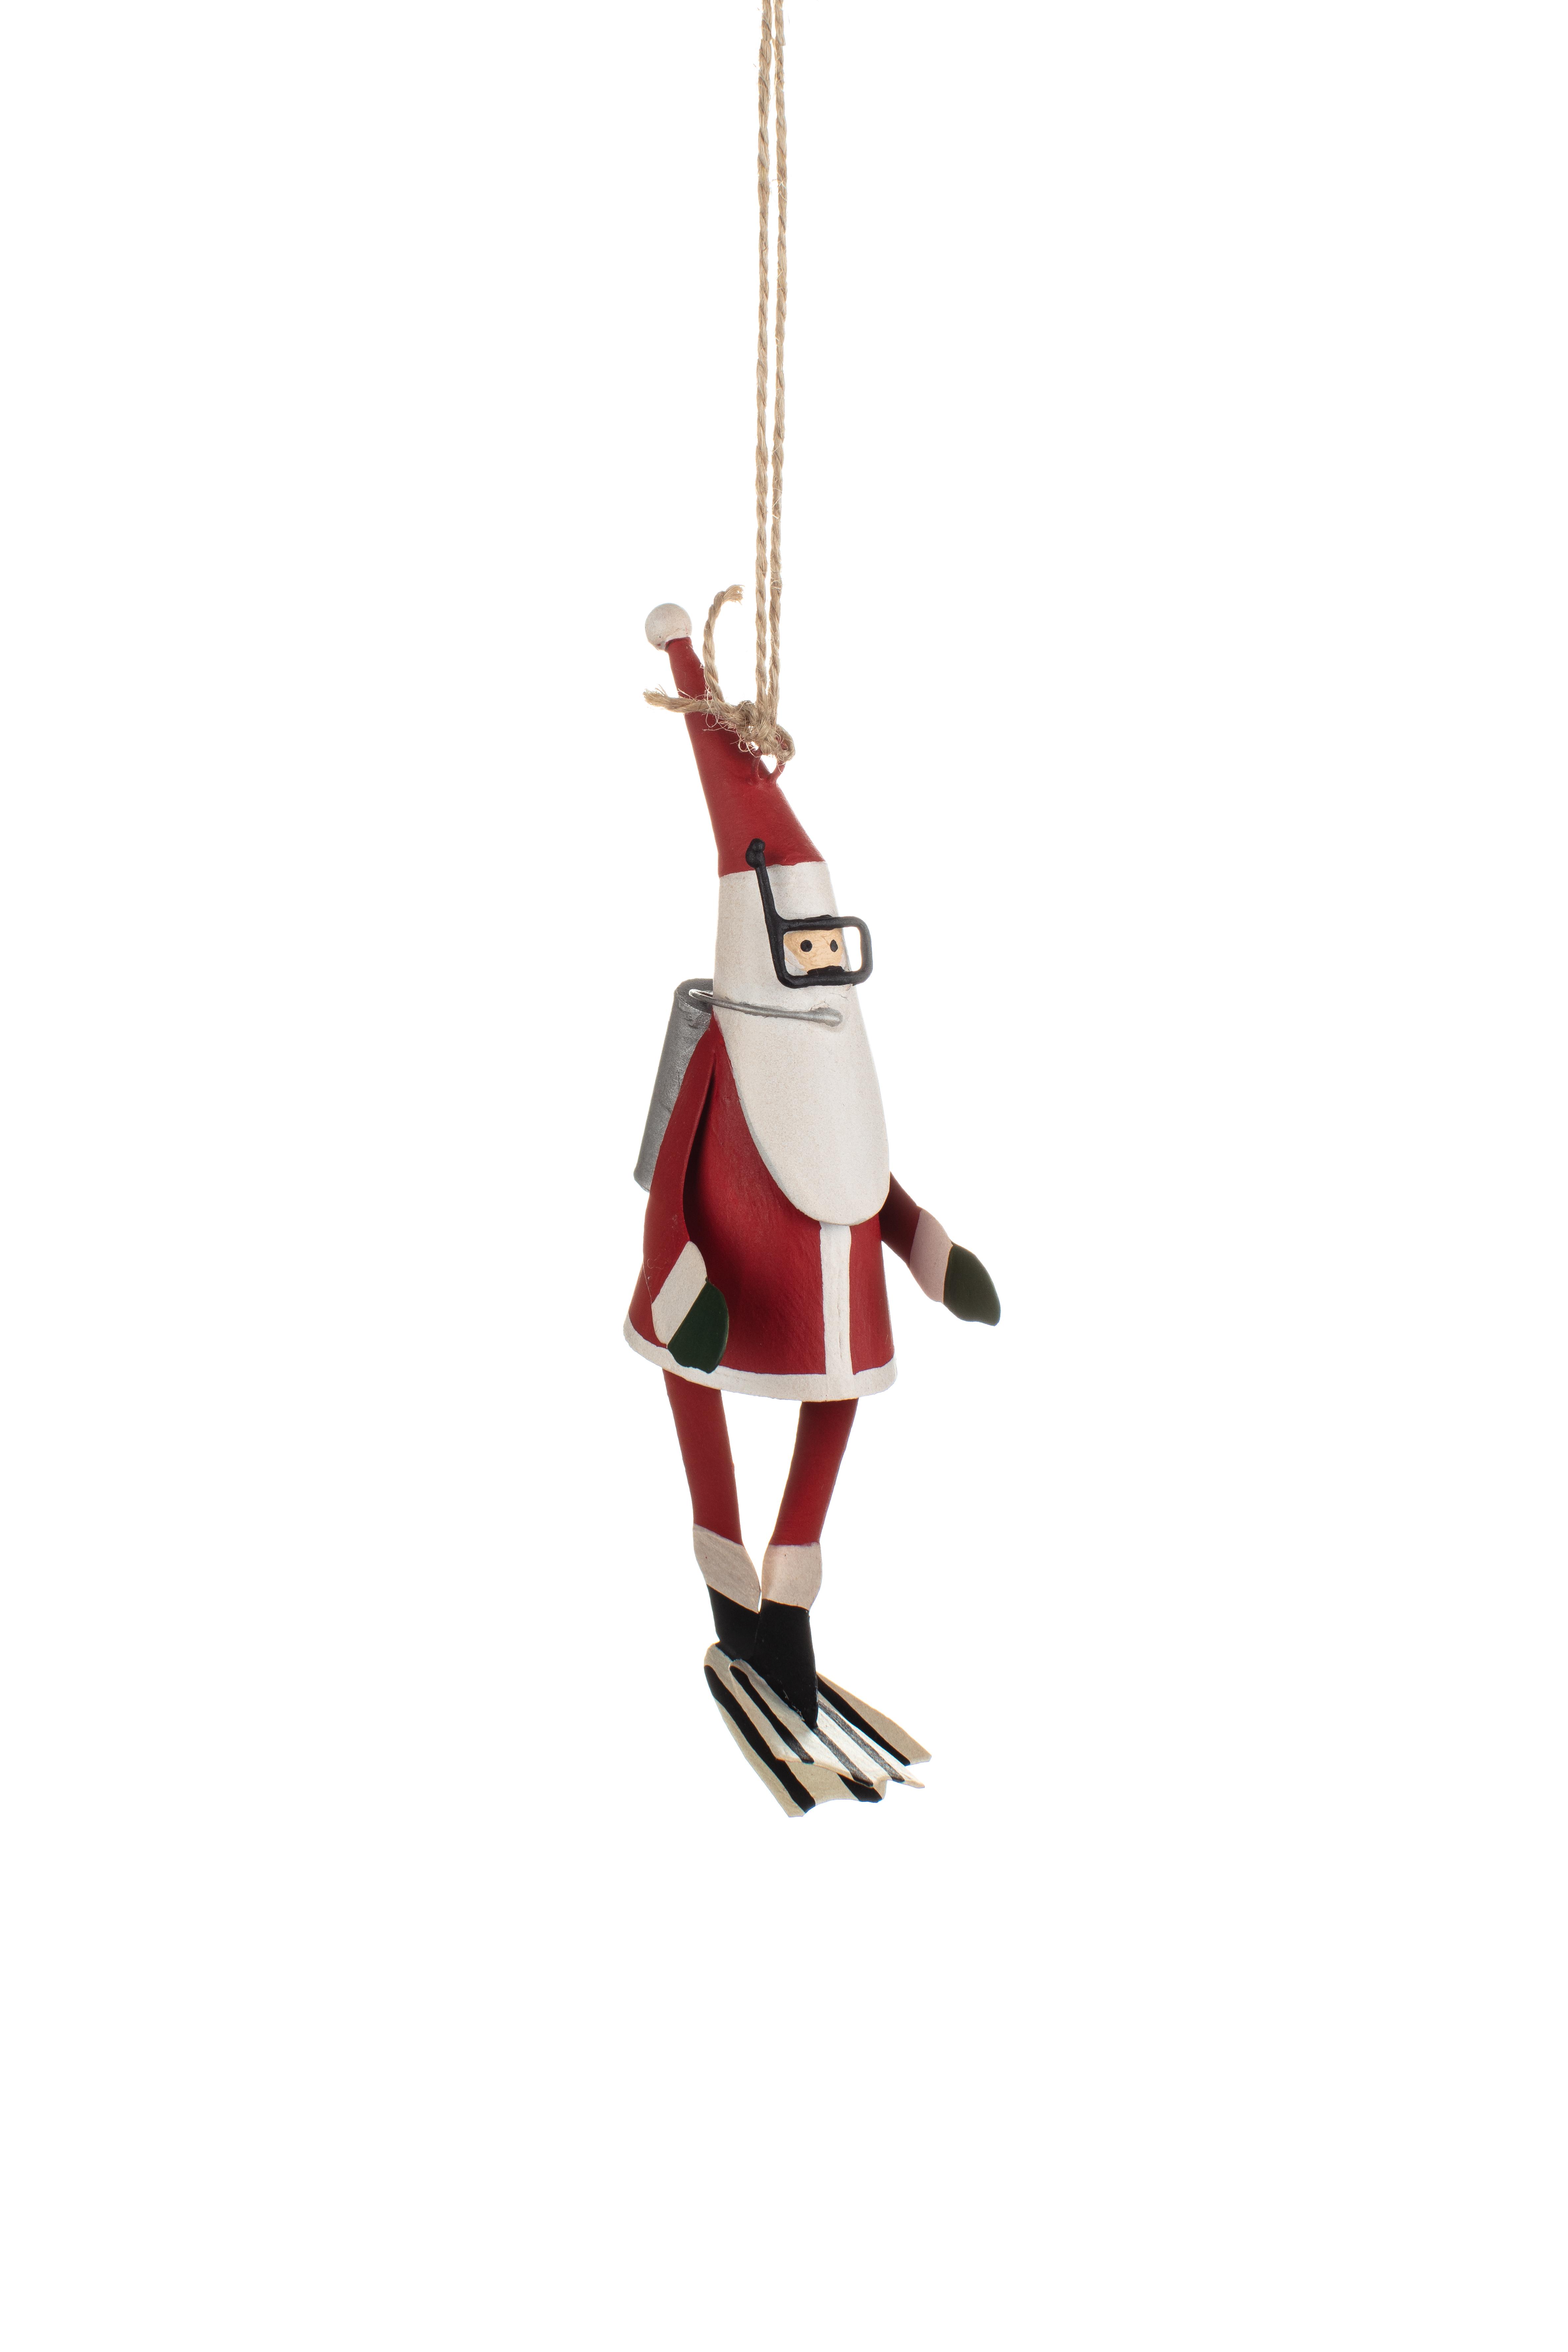 Xmas: Tin Santa in Scuba Gear